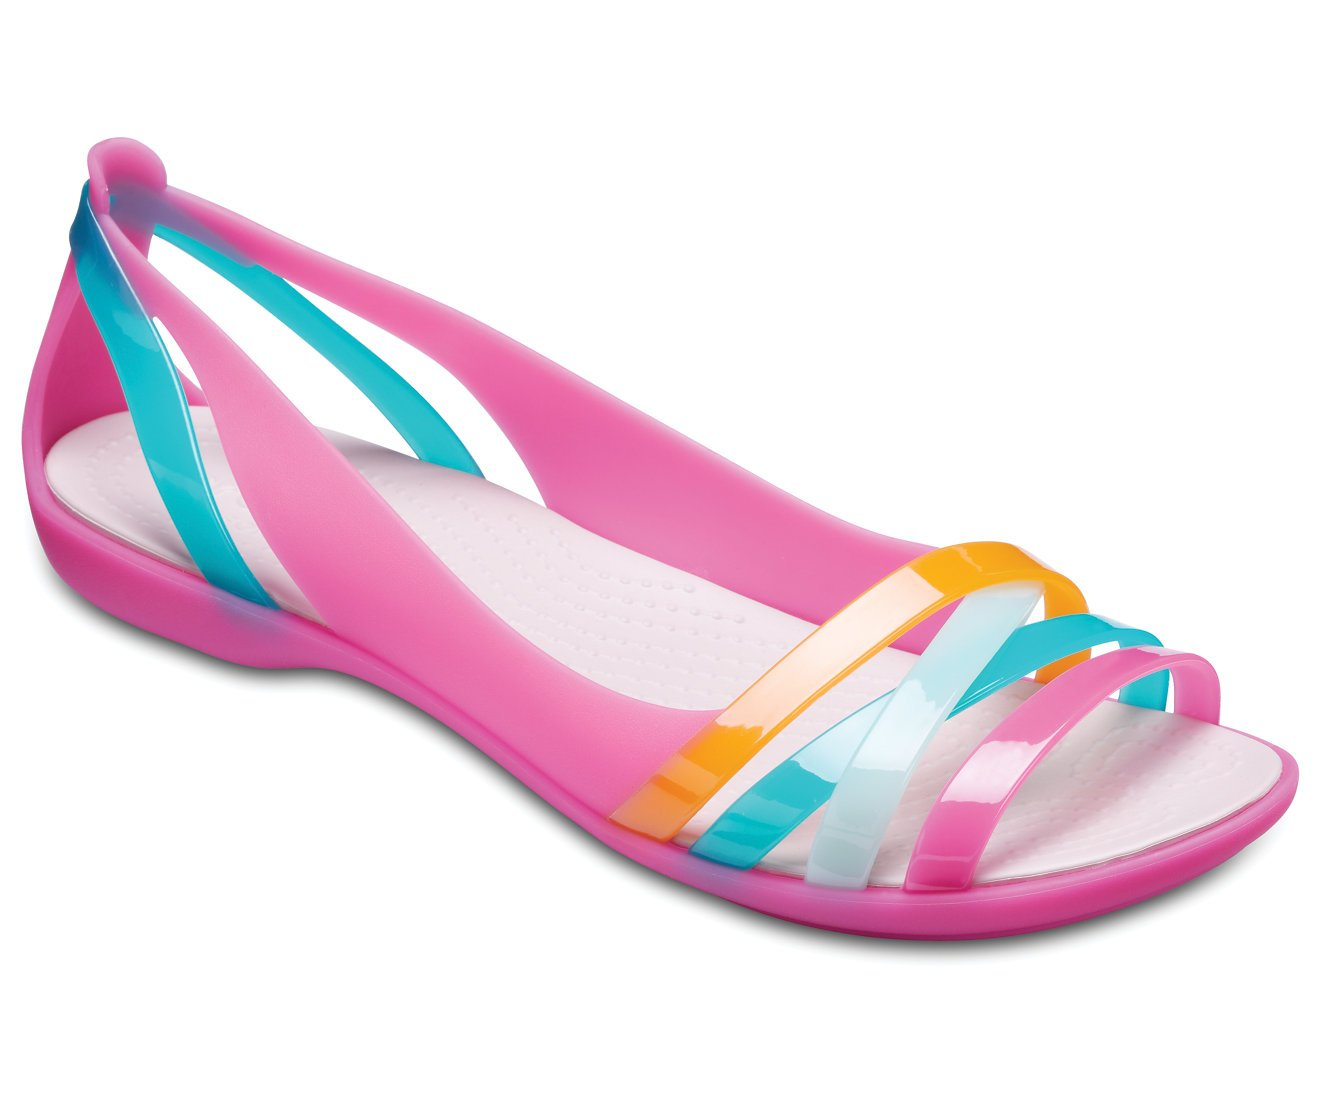 crocs Damen Isabella Huarache Ii Flat Women Peeptoe Ballerinas Paradise Pink/Rose Dust